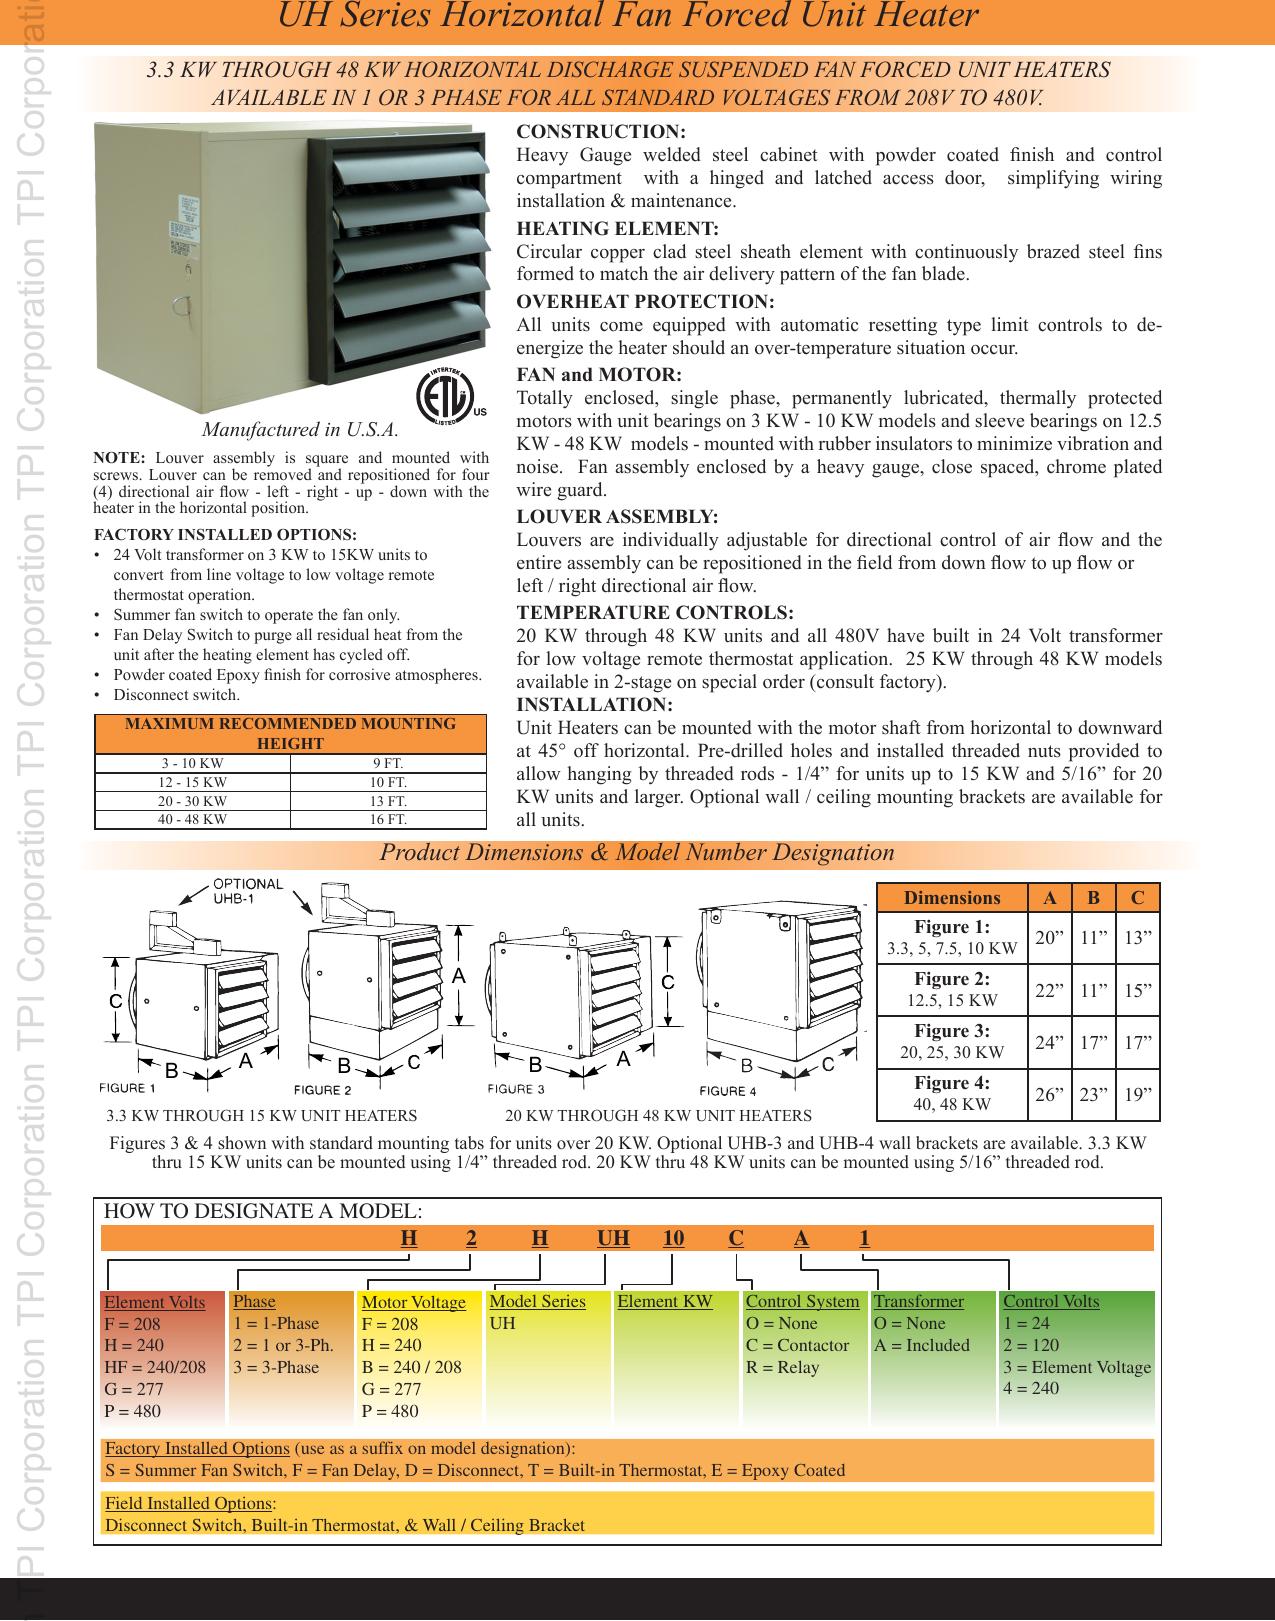 usermanual wiki pdf 83781attachmenturl 1753320393 Transmission Wiring Diagram